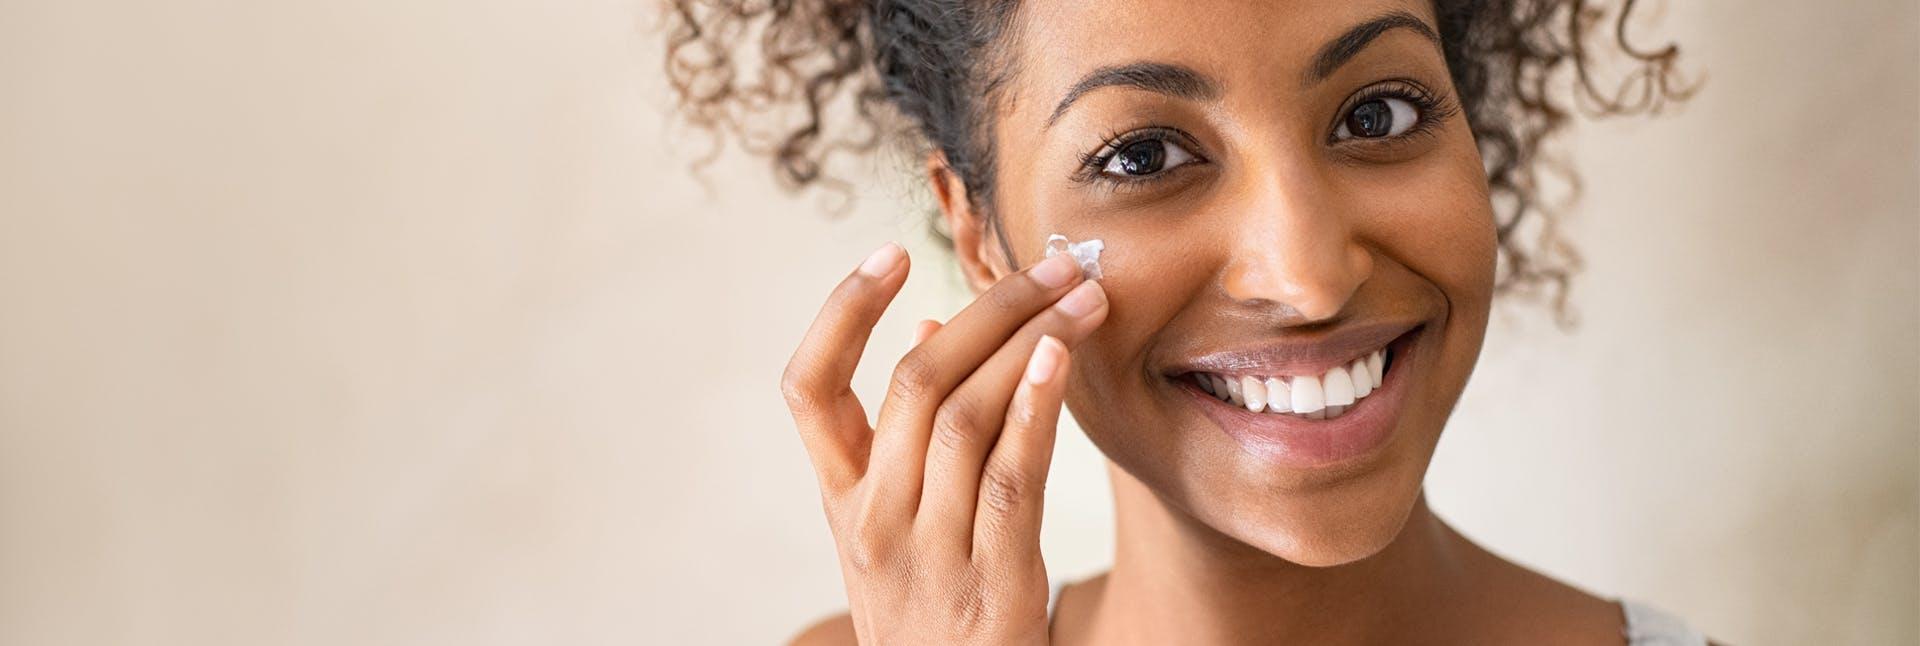 Woman putting on skin care